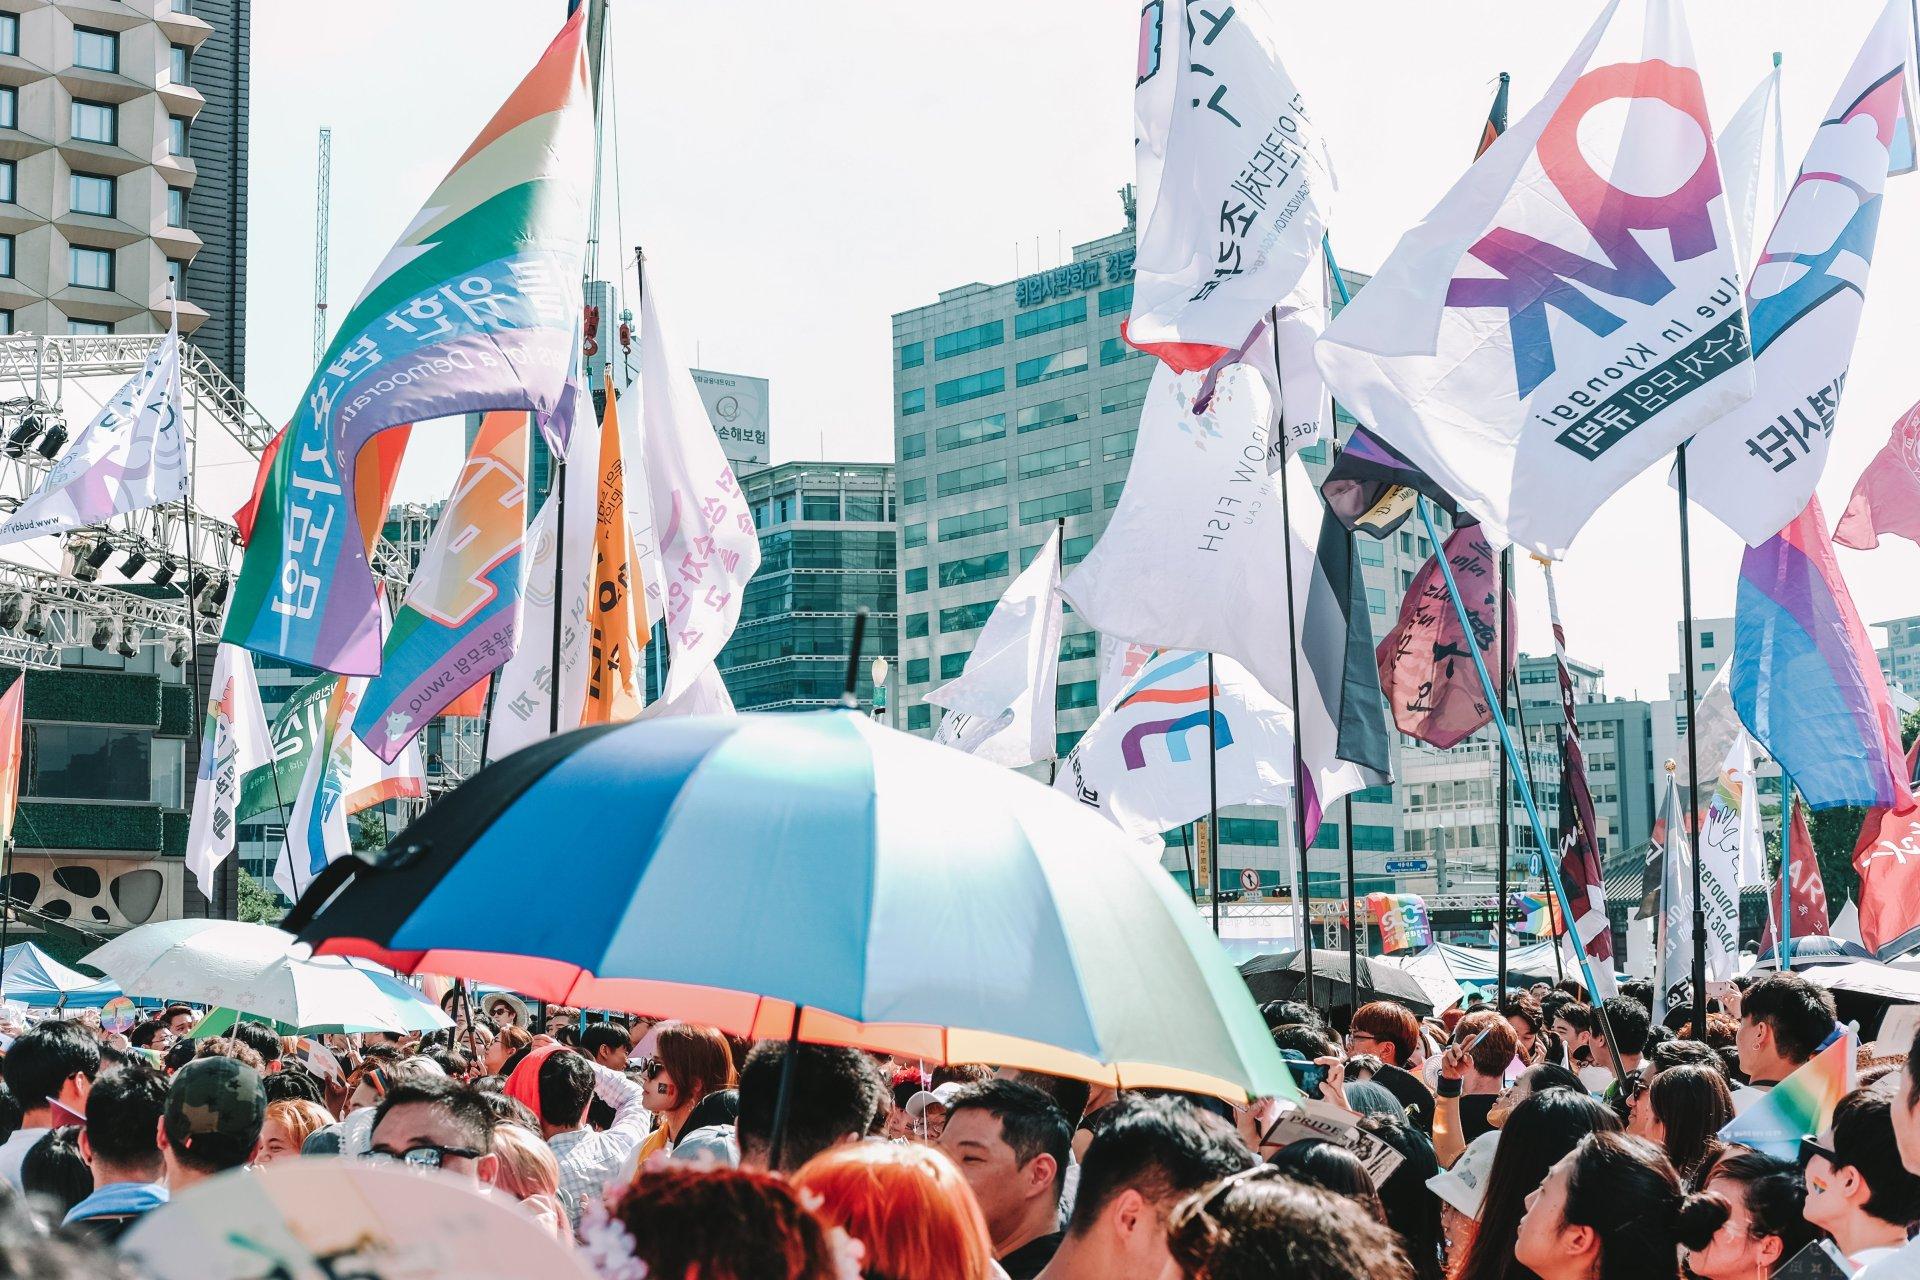 seoul pride 2018